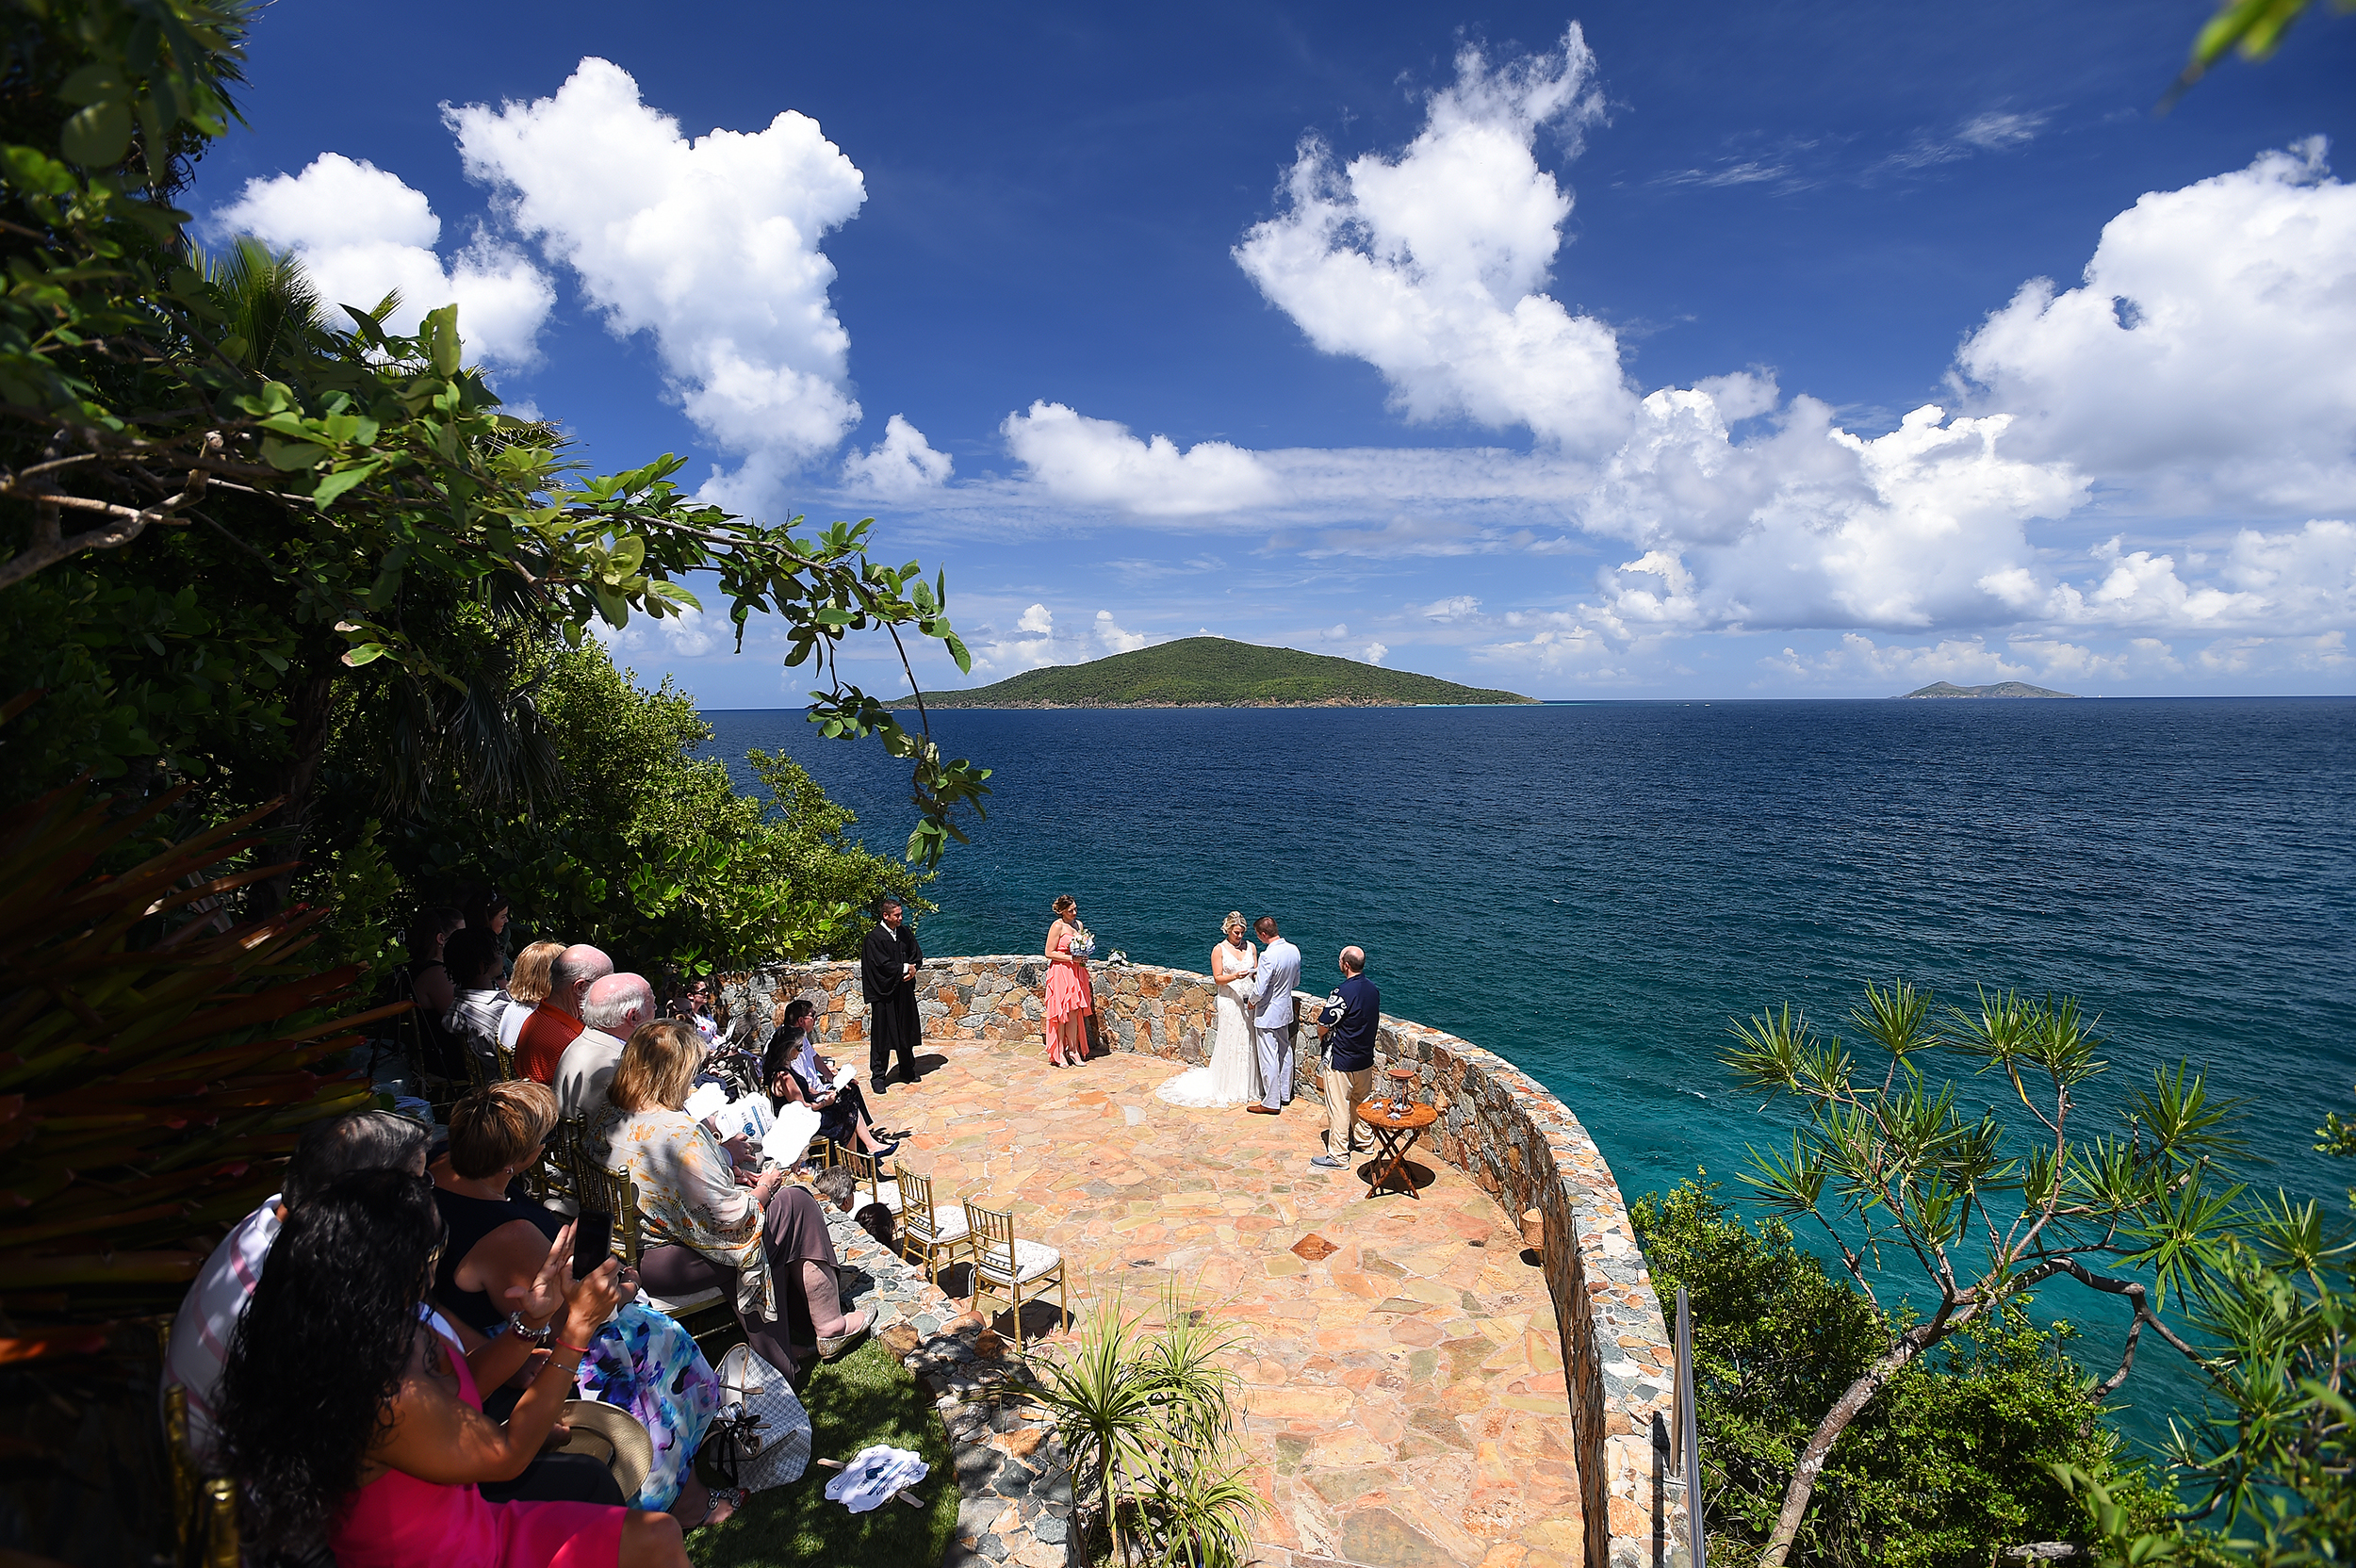 Villa Wedding in the USVI - Villa Norbu Weddings - USVI Wedding Services